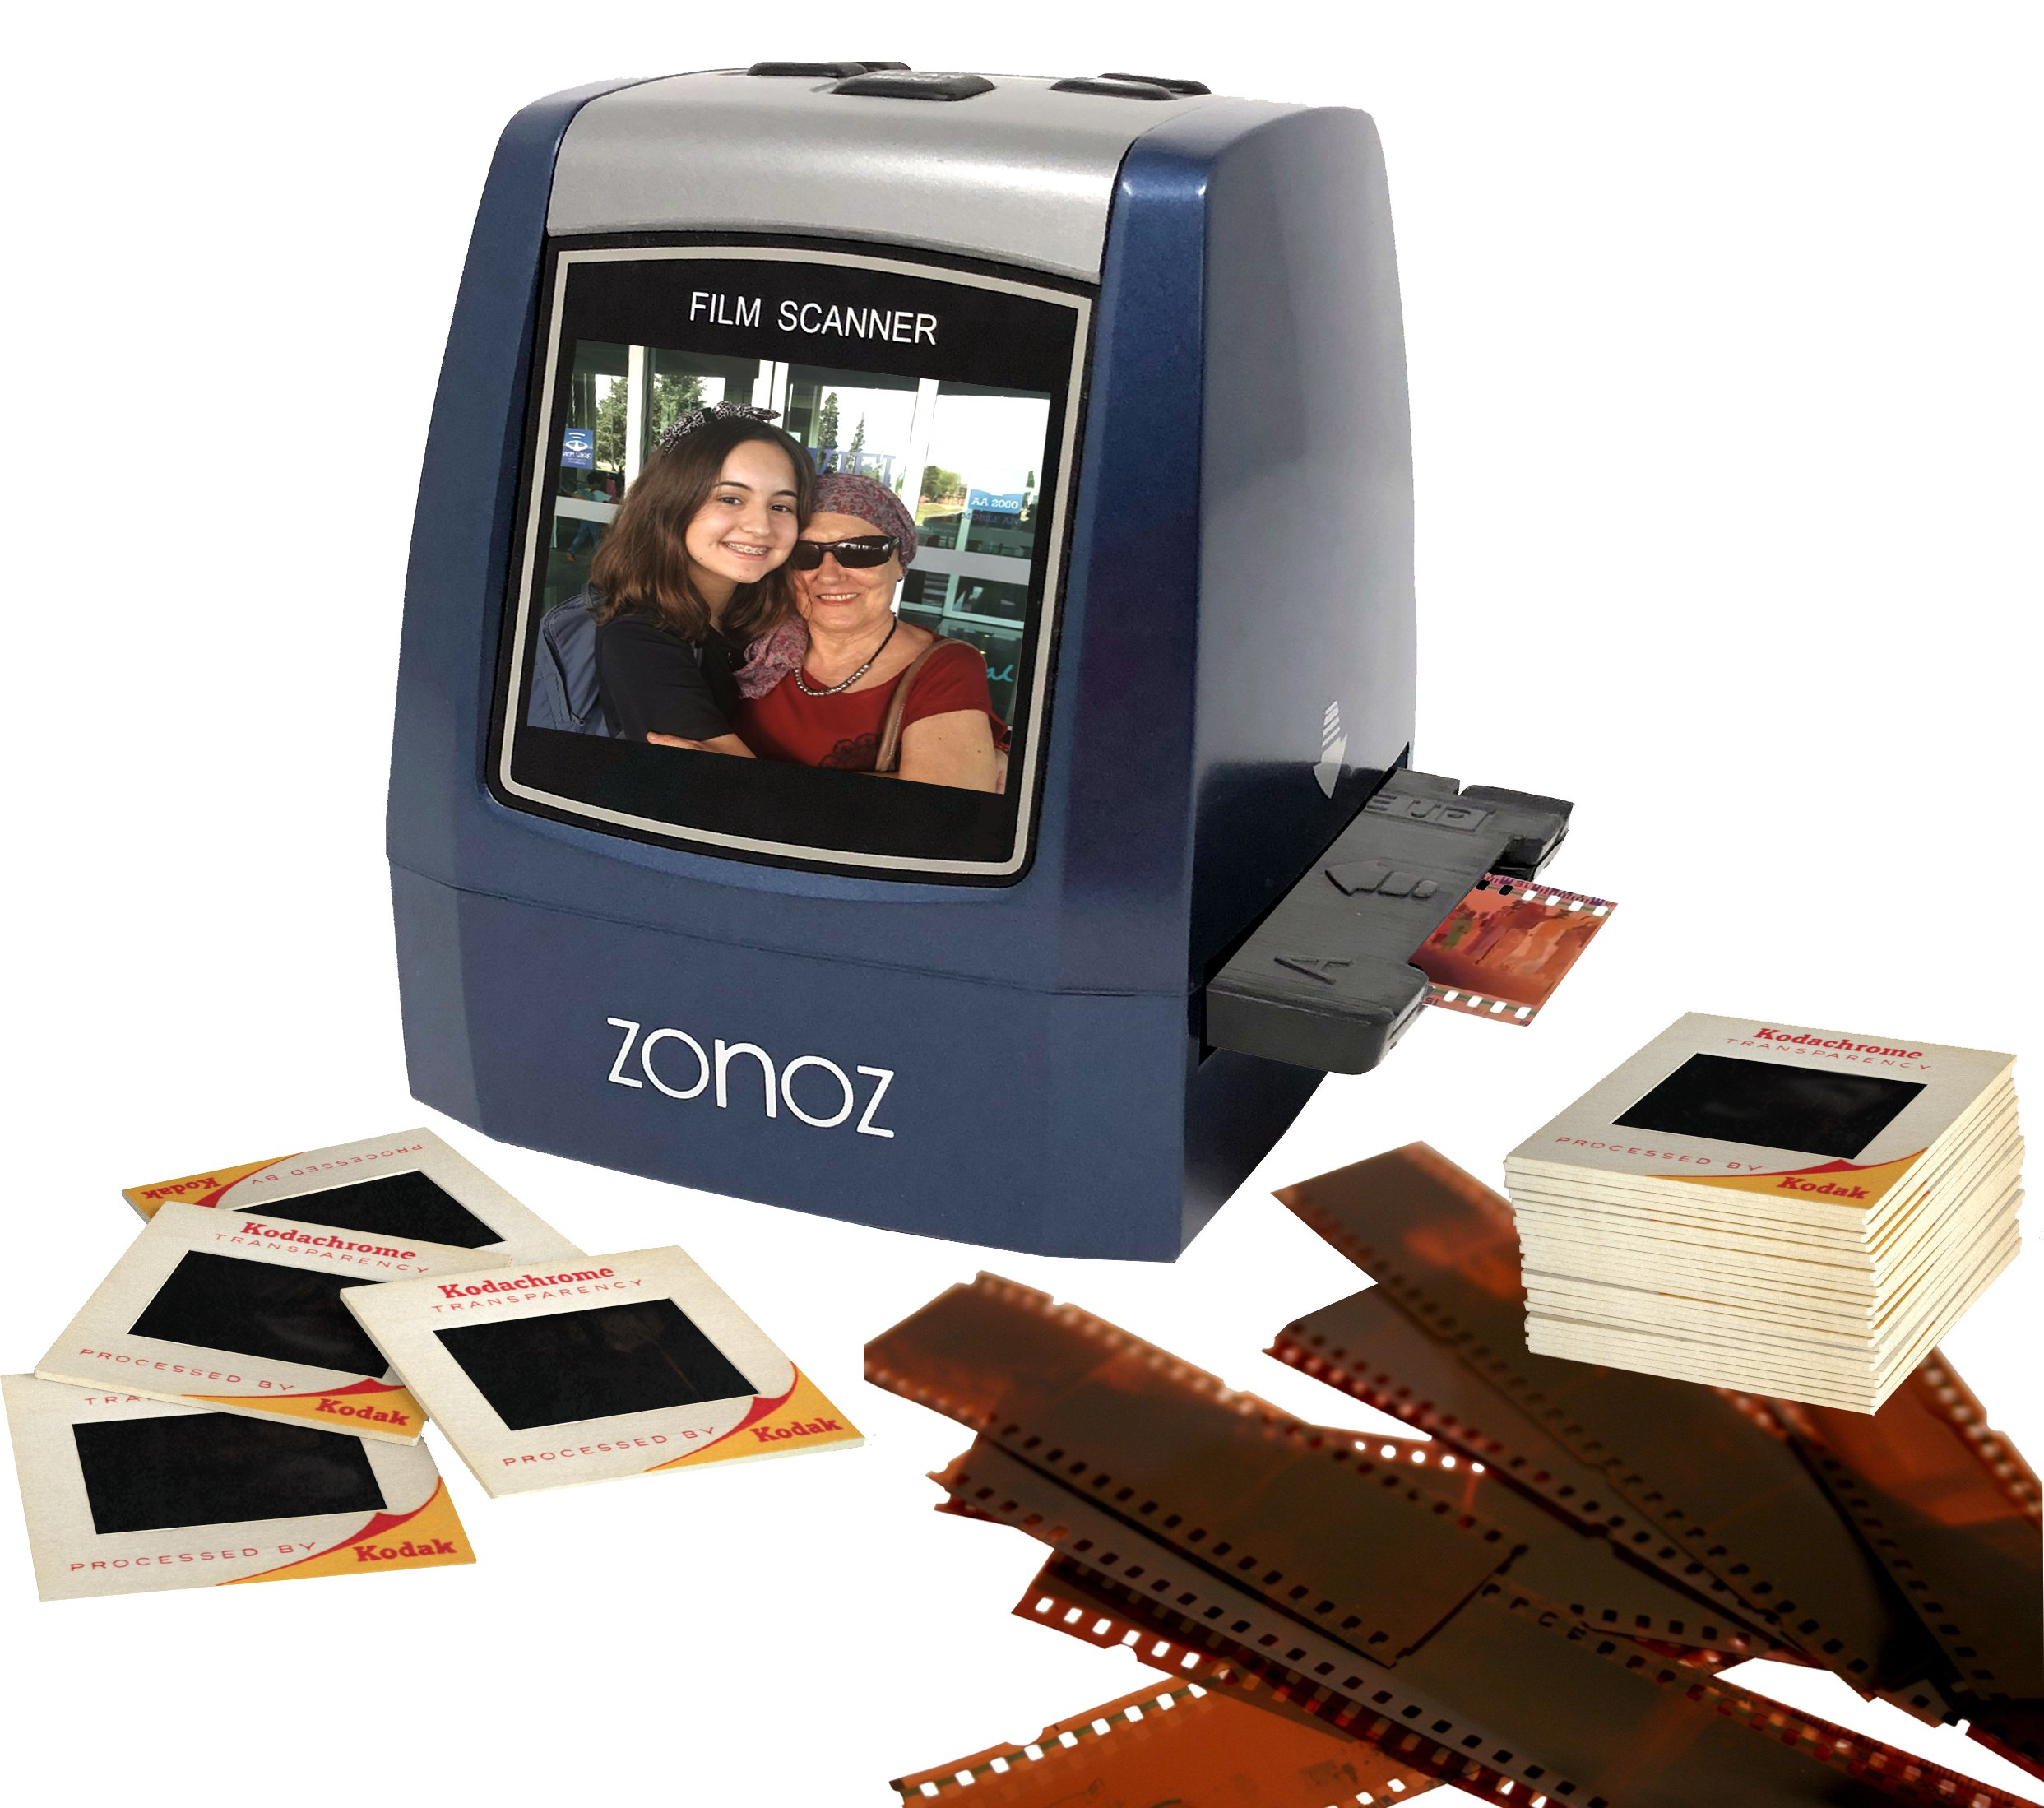 ZONOZ FS-3 22MP All-in-1 Film & Slide Converter Scanner w/Speed-Load Adapters for 35mm, 126, 110 Negative & Slides, Super 8 Films - Includes Worldwide Voltage 110V/240V AC Adapter (Blue) by zonoz